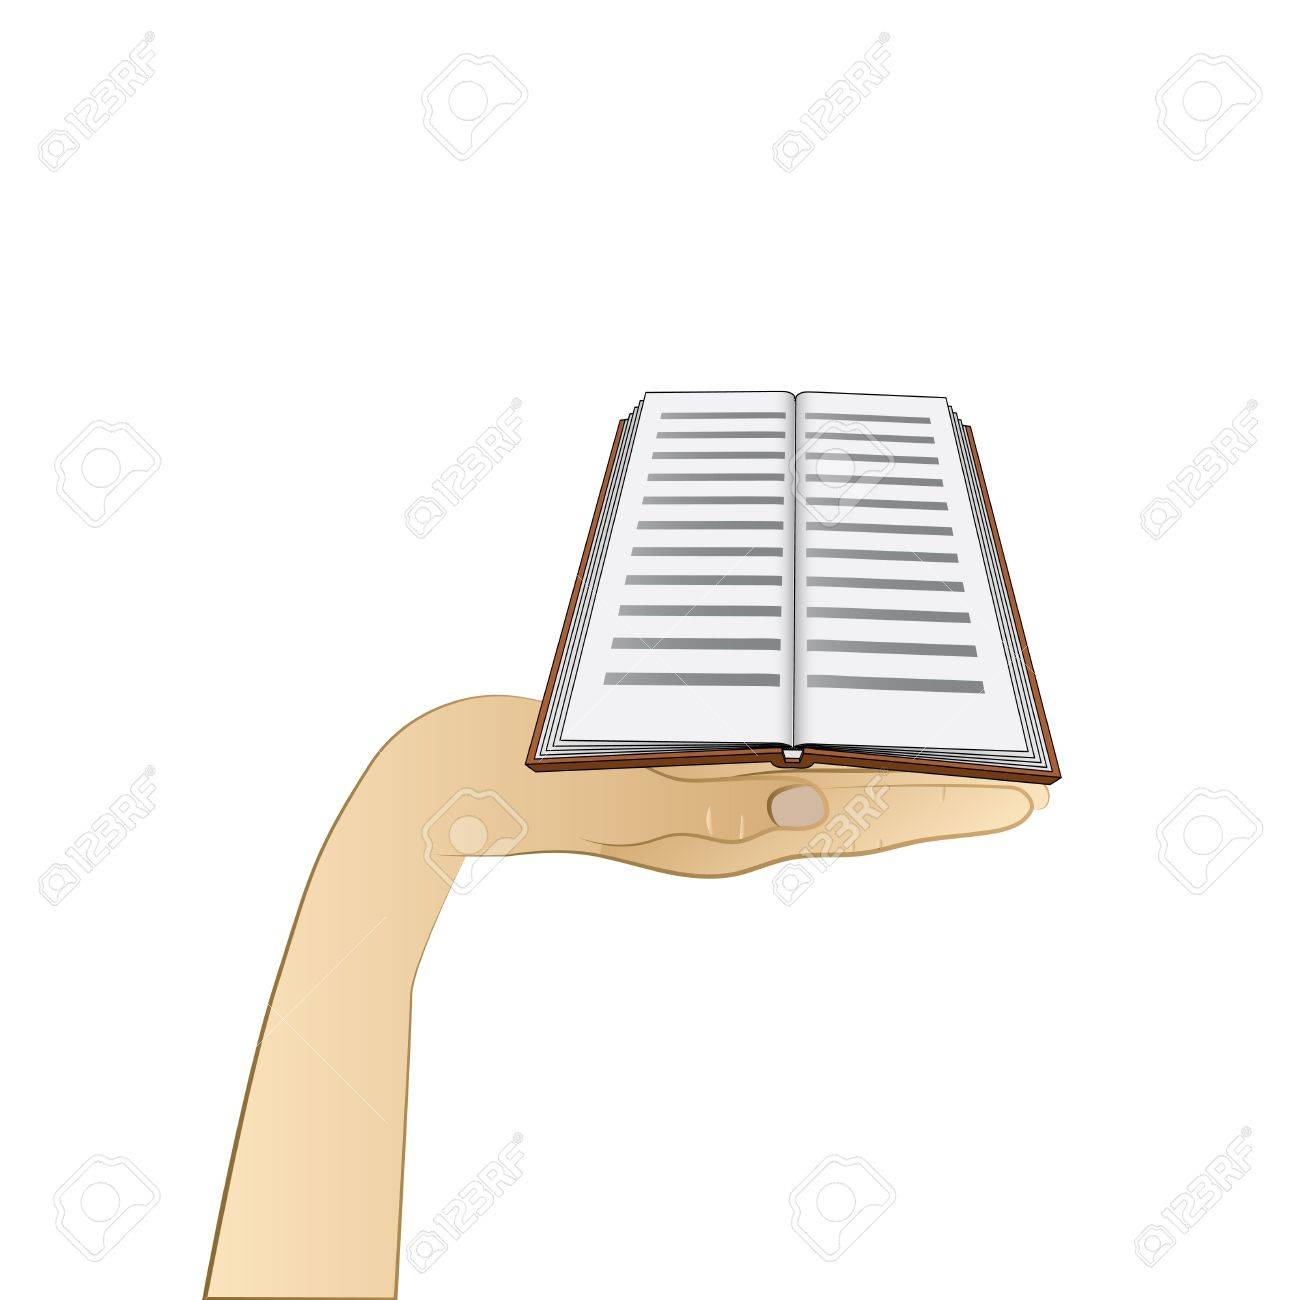 education book on human palm vector illustration Stock Vector - 21228432